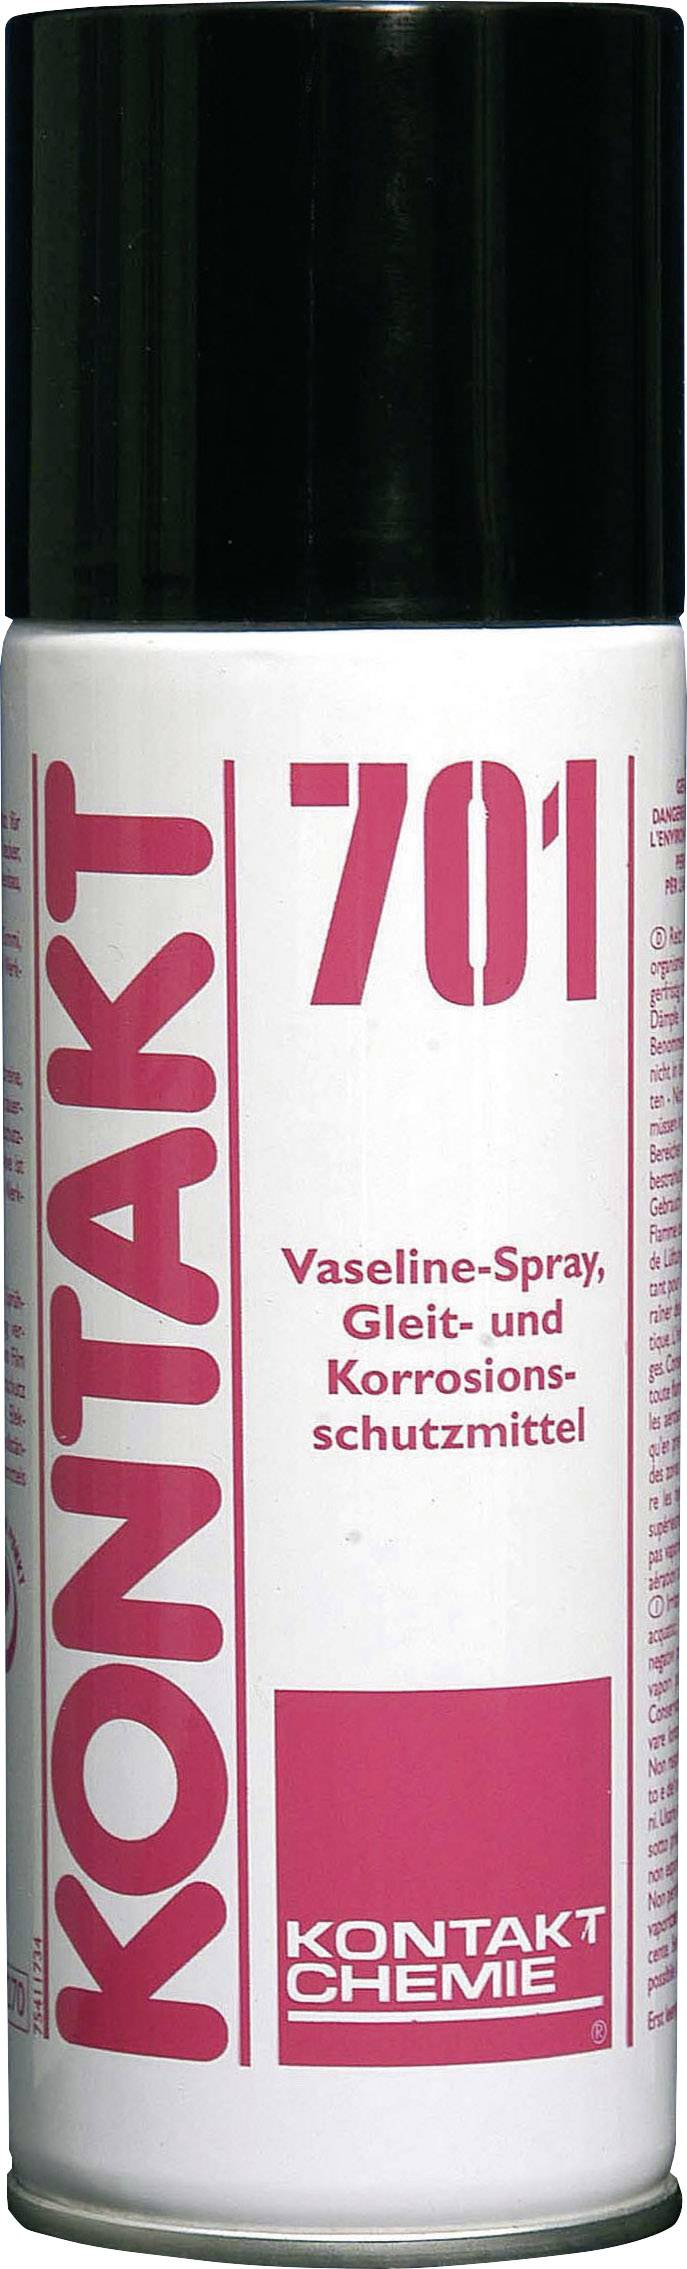 Mazací sprej Kontakt Chemie Kontakt 701 83509-AG 200 ml